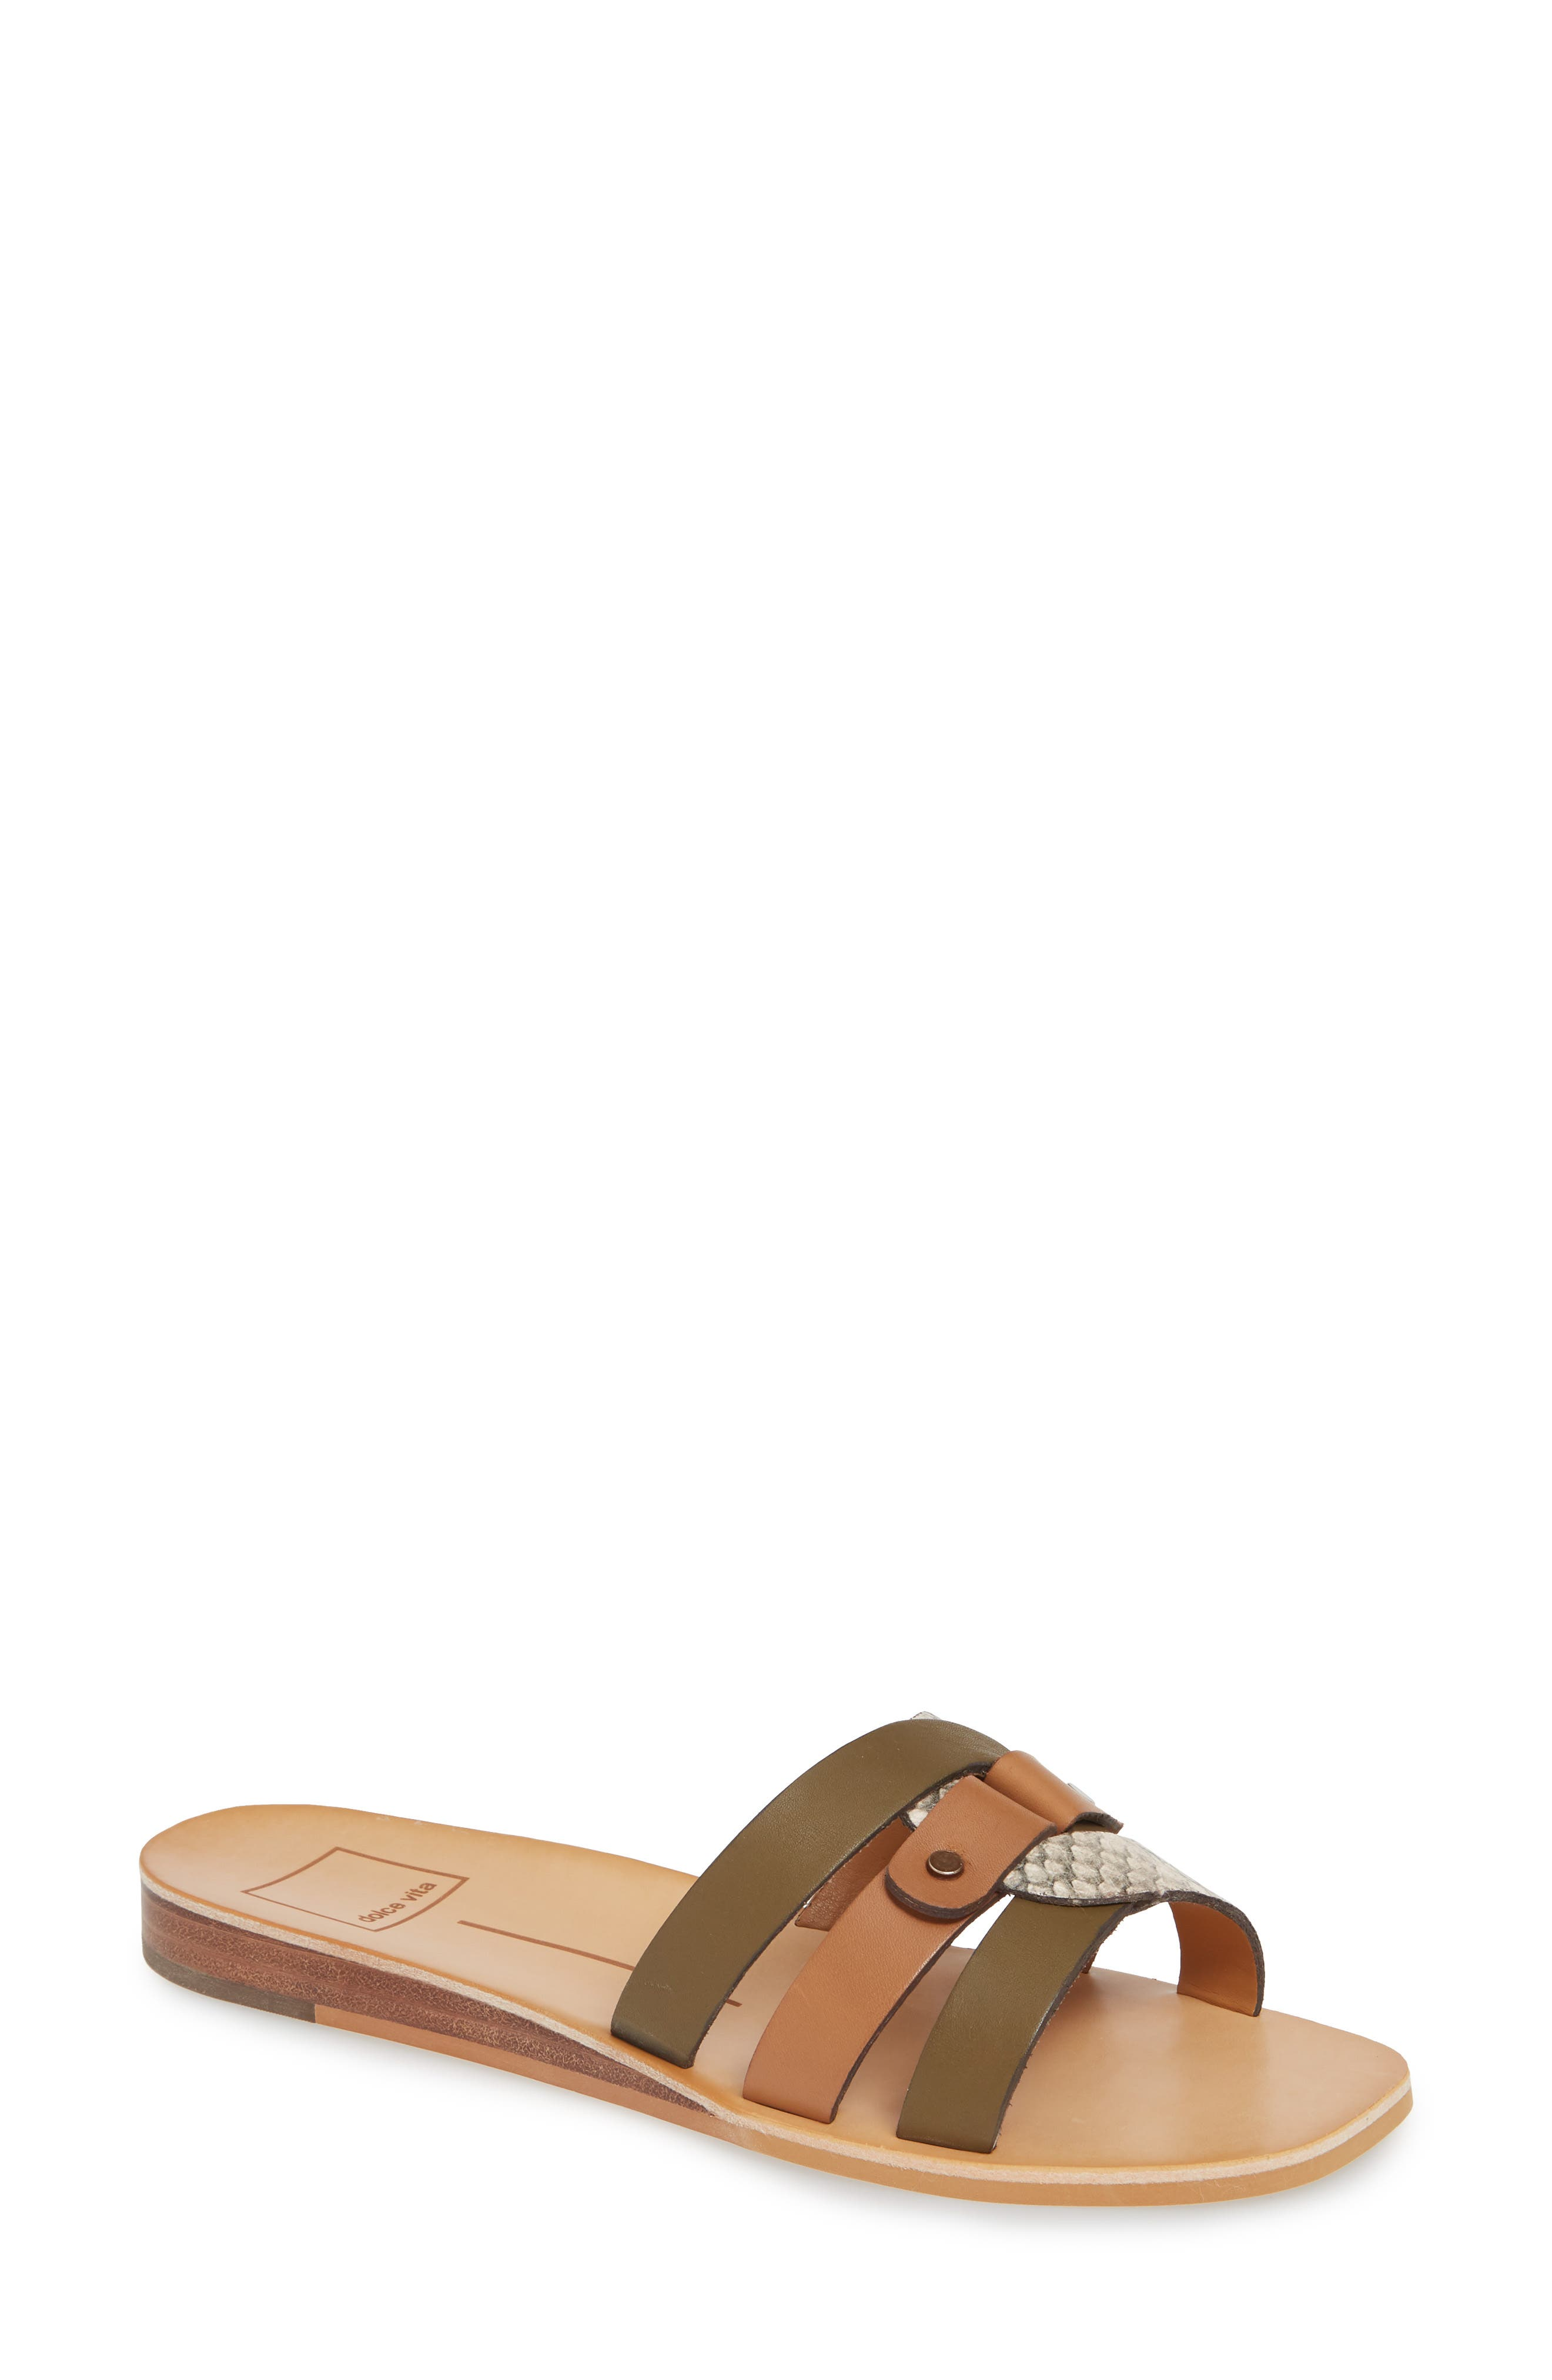 Dolce Vita Cait Slide Sandal, Brown